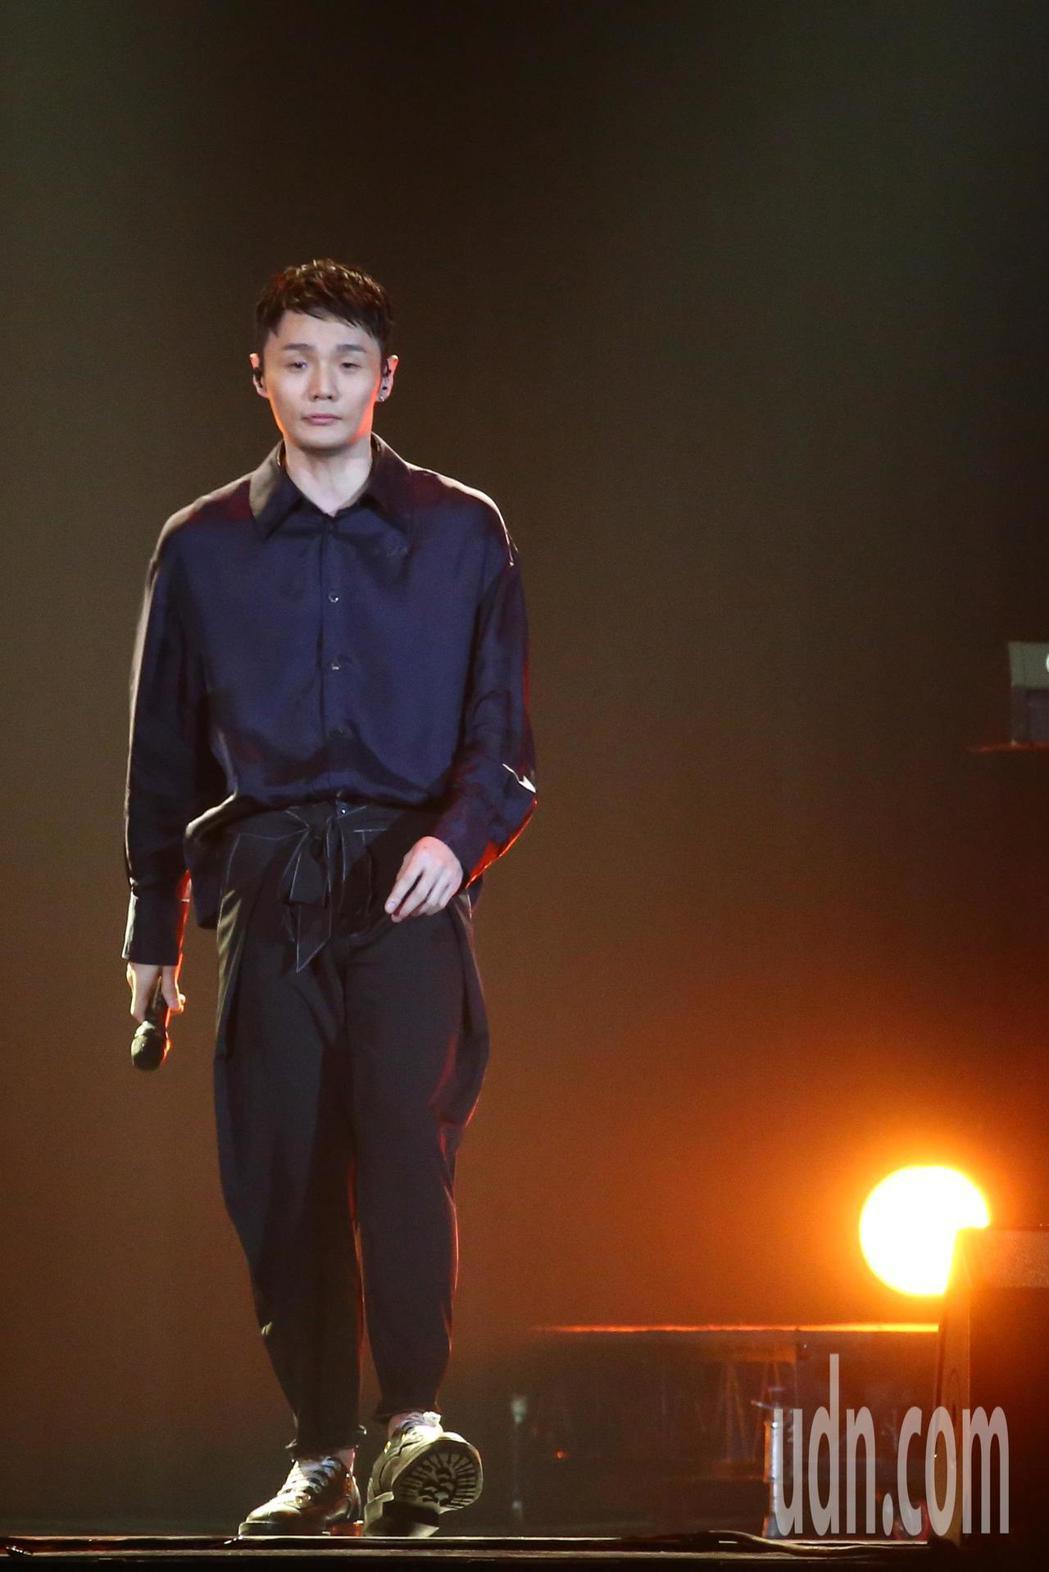 2019 hito流行音樂獎頒獎典禮今天在小巨蛋舉行,李榮浩擔任表演嘉賓演唱《耳